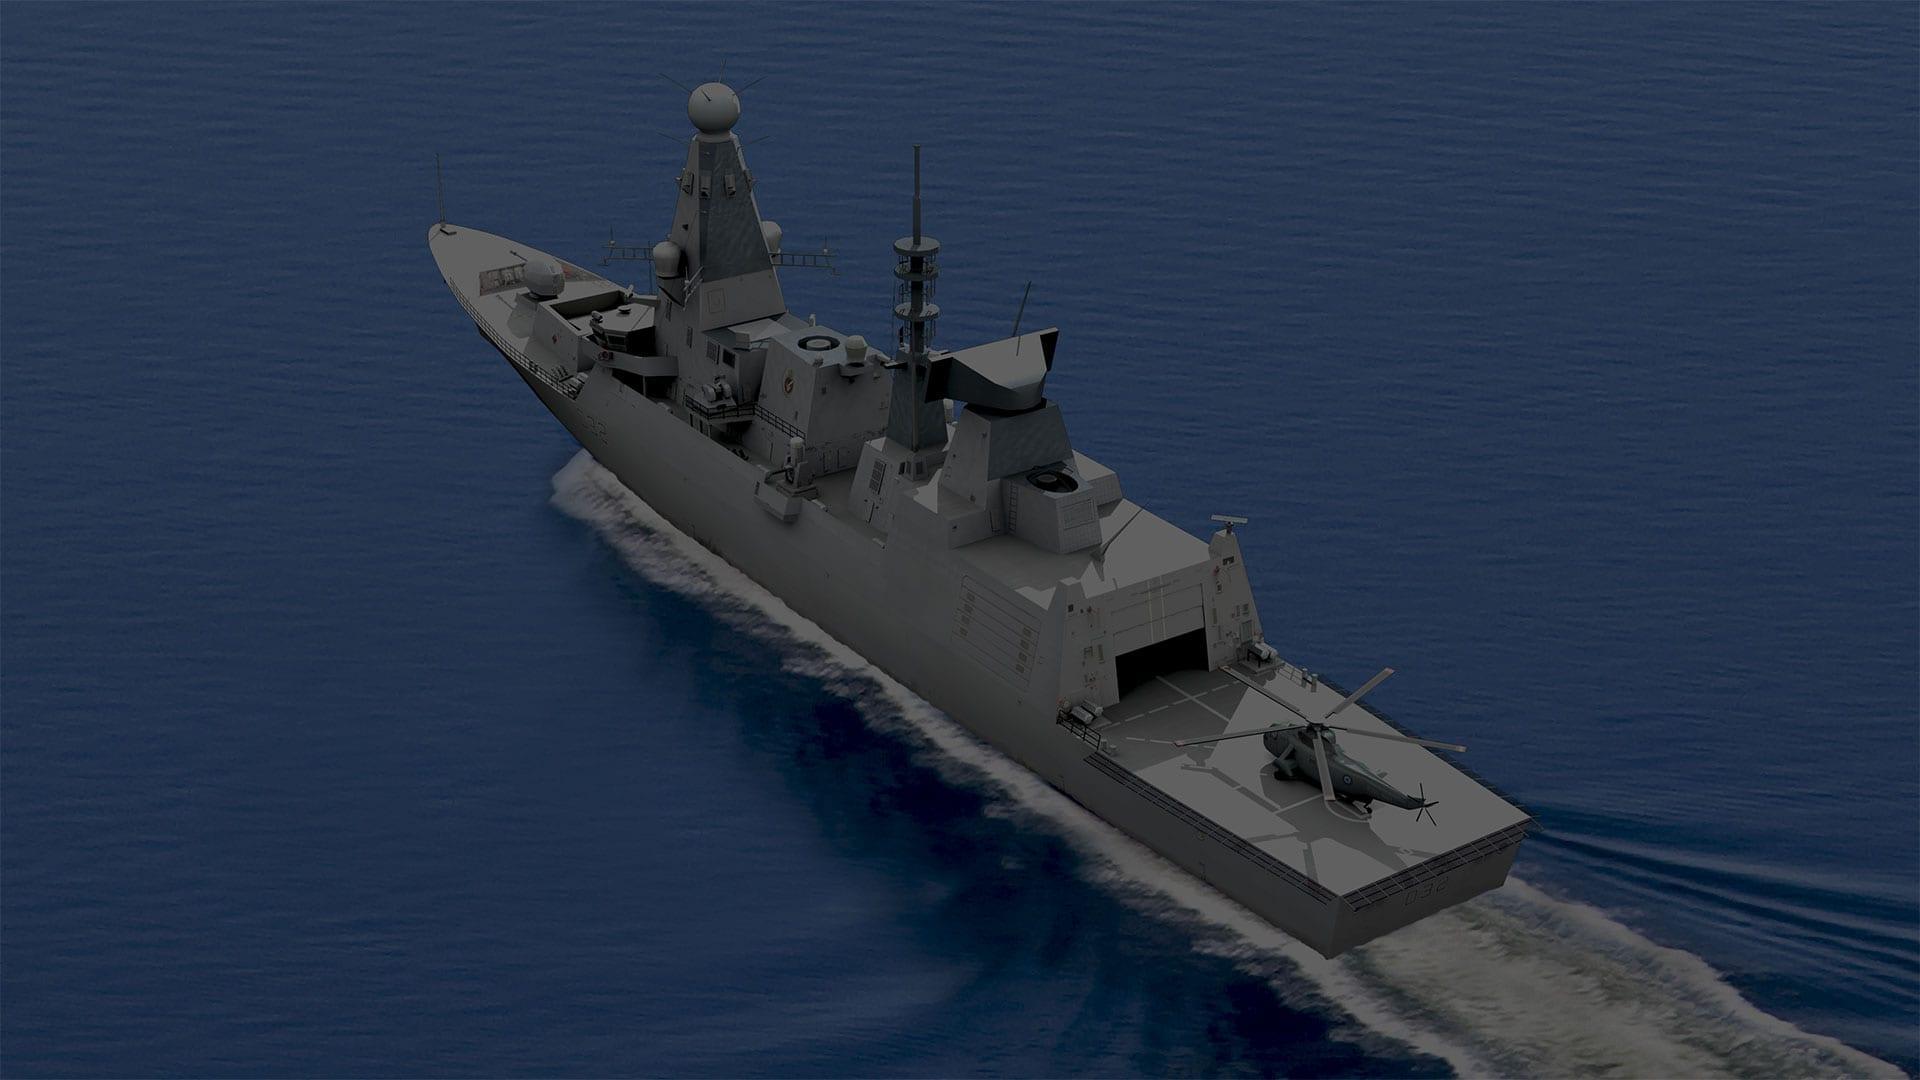 Type 45 Frigate